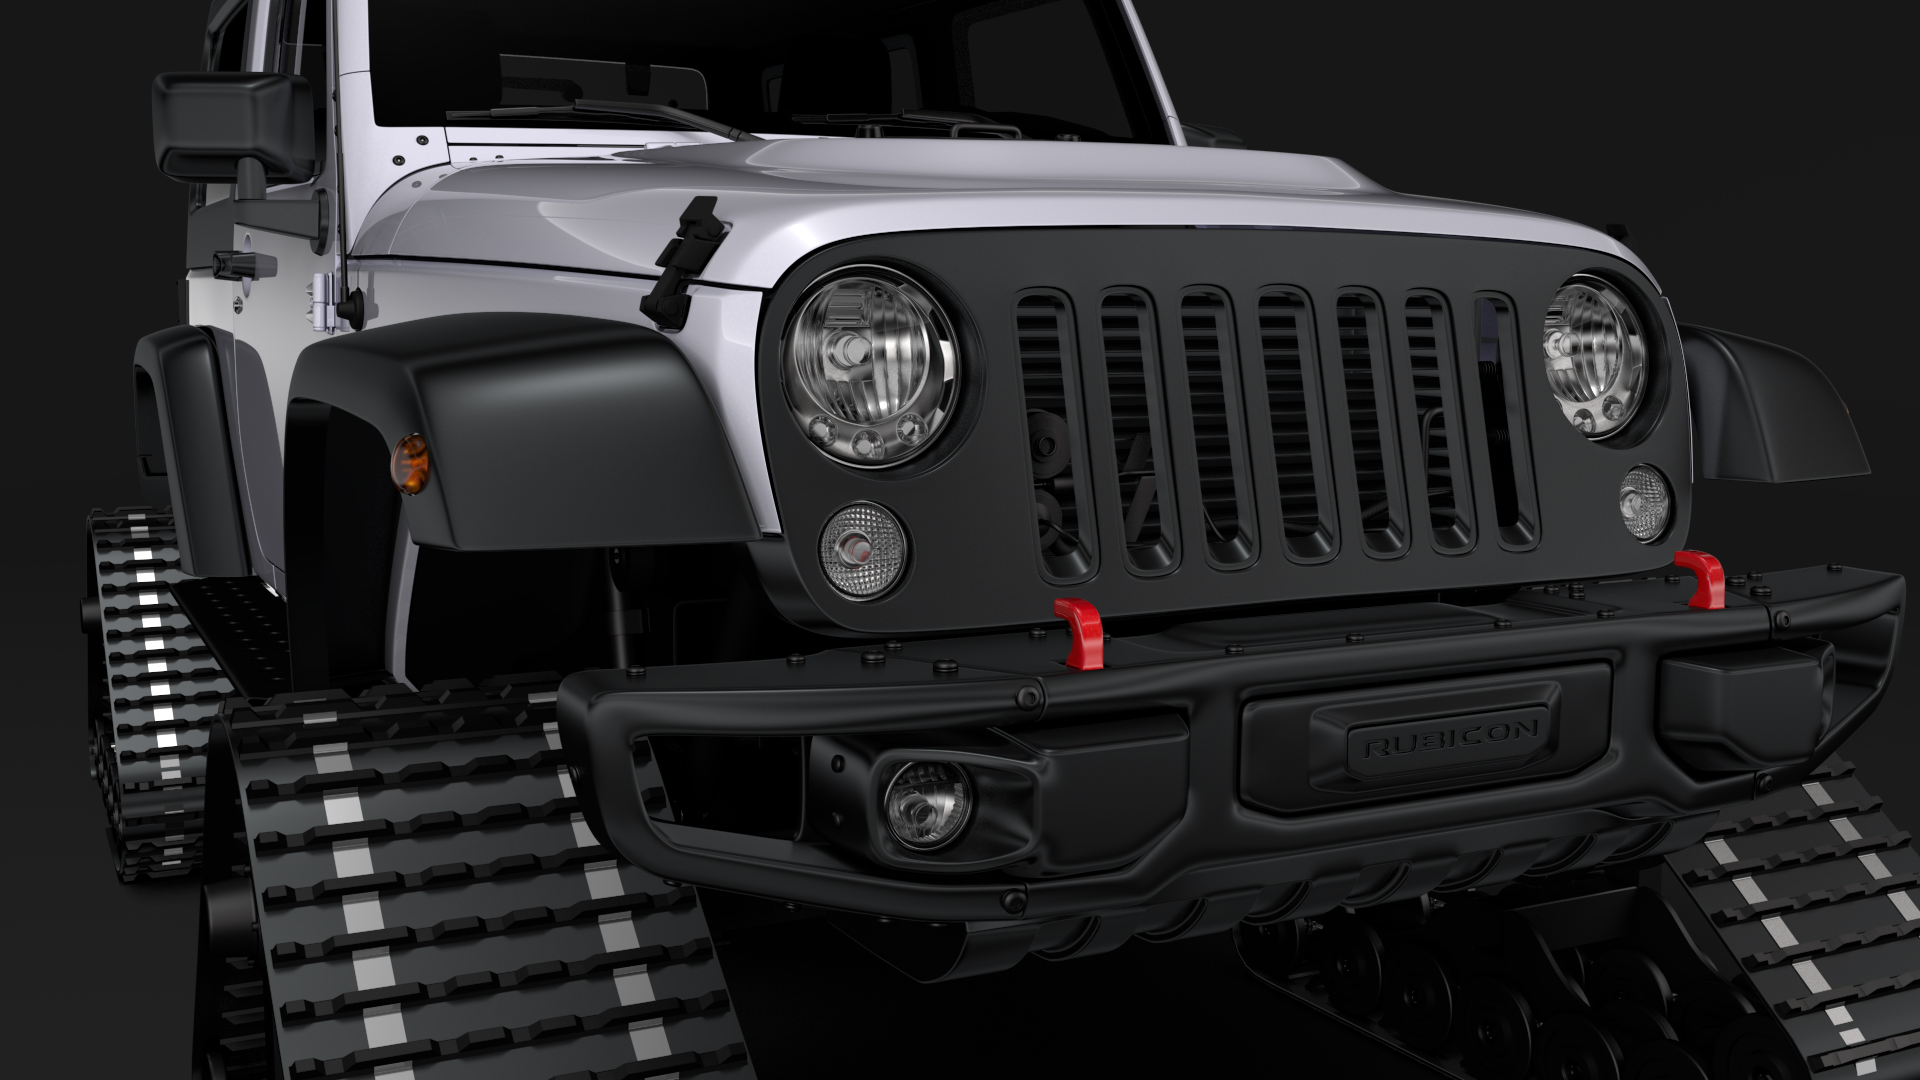 jeep wrangler crawler rubicon recon jk 2017 3d model max fbx c4d lwo ma mb hrc xsi obj 276906